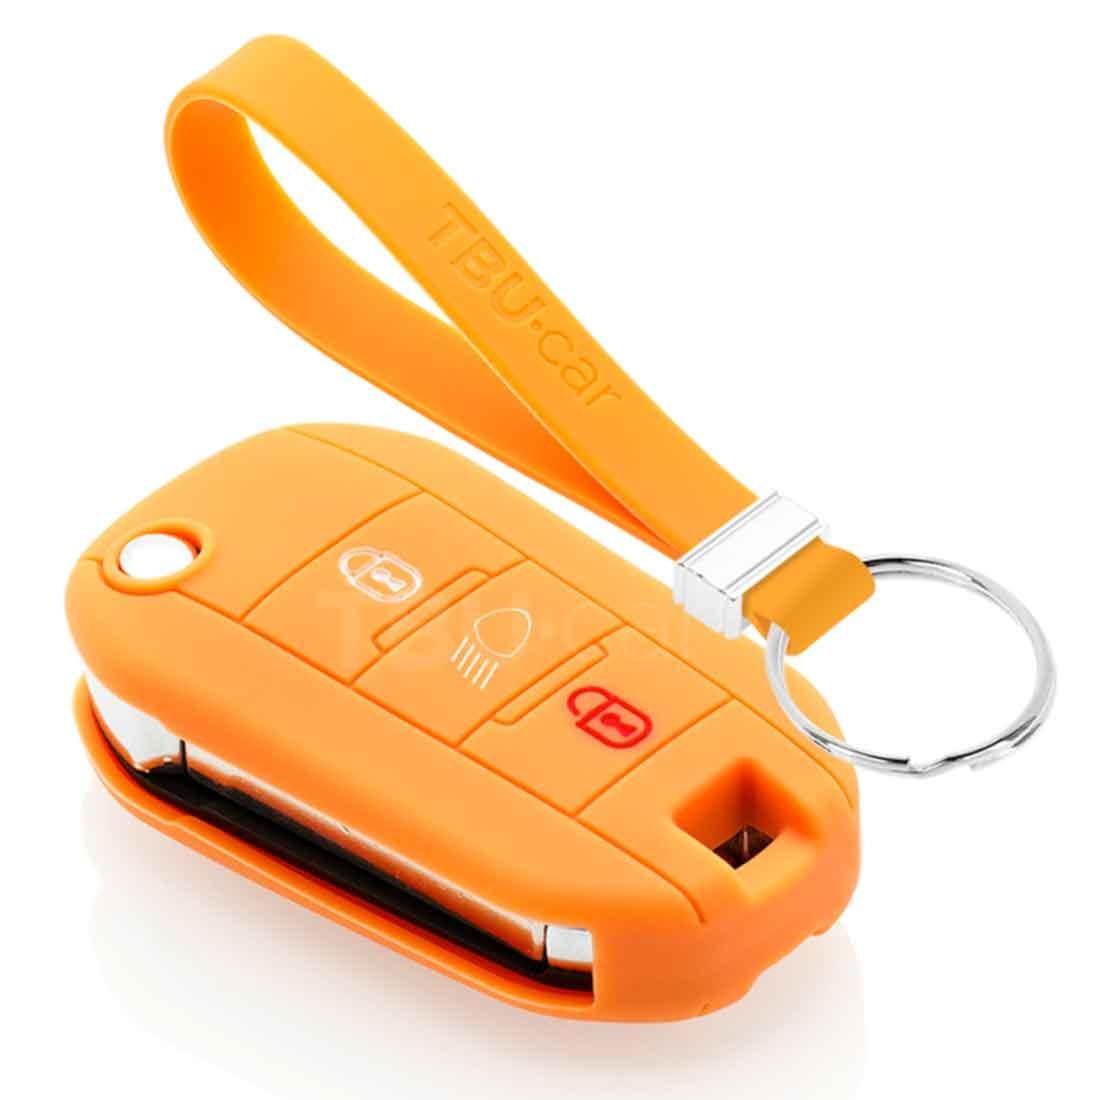 TBU car TBU car Autoschlüssel Hülle kompatibel mit Peugeot 3 Tasten (Licht Taste) - Schutzhülle aus Silikon - Auto Schlüsselhülle Cover in Orange